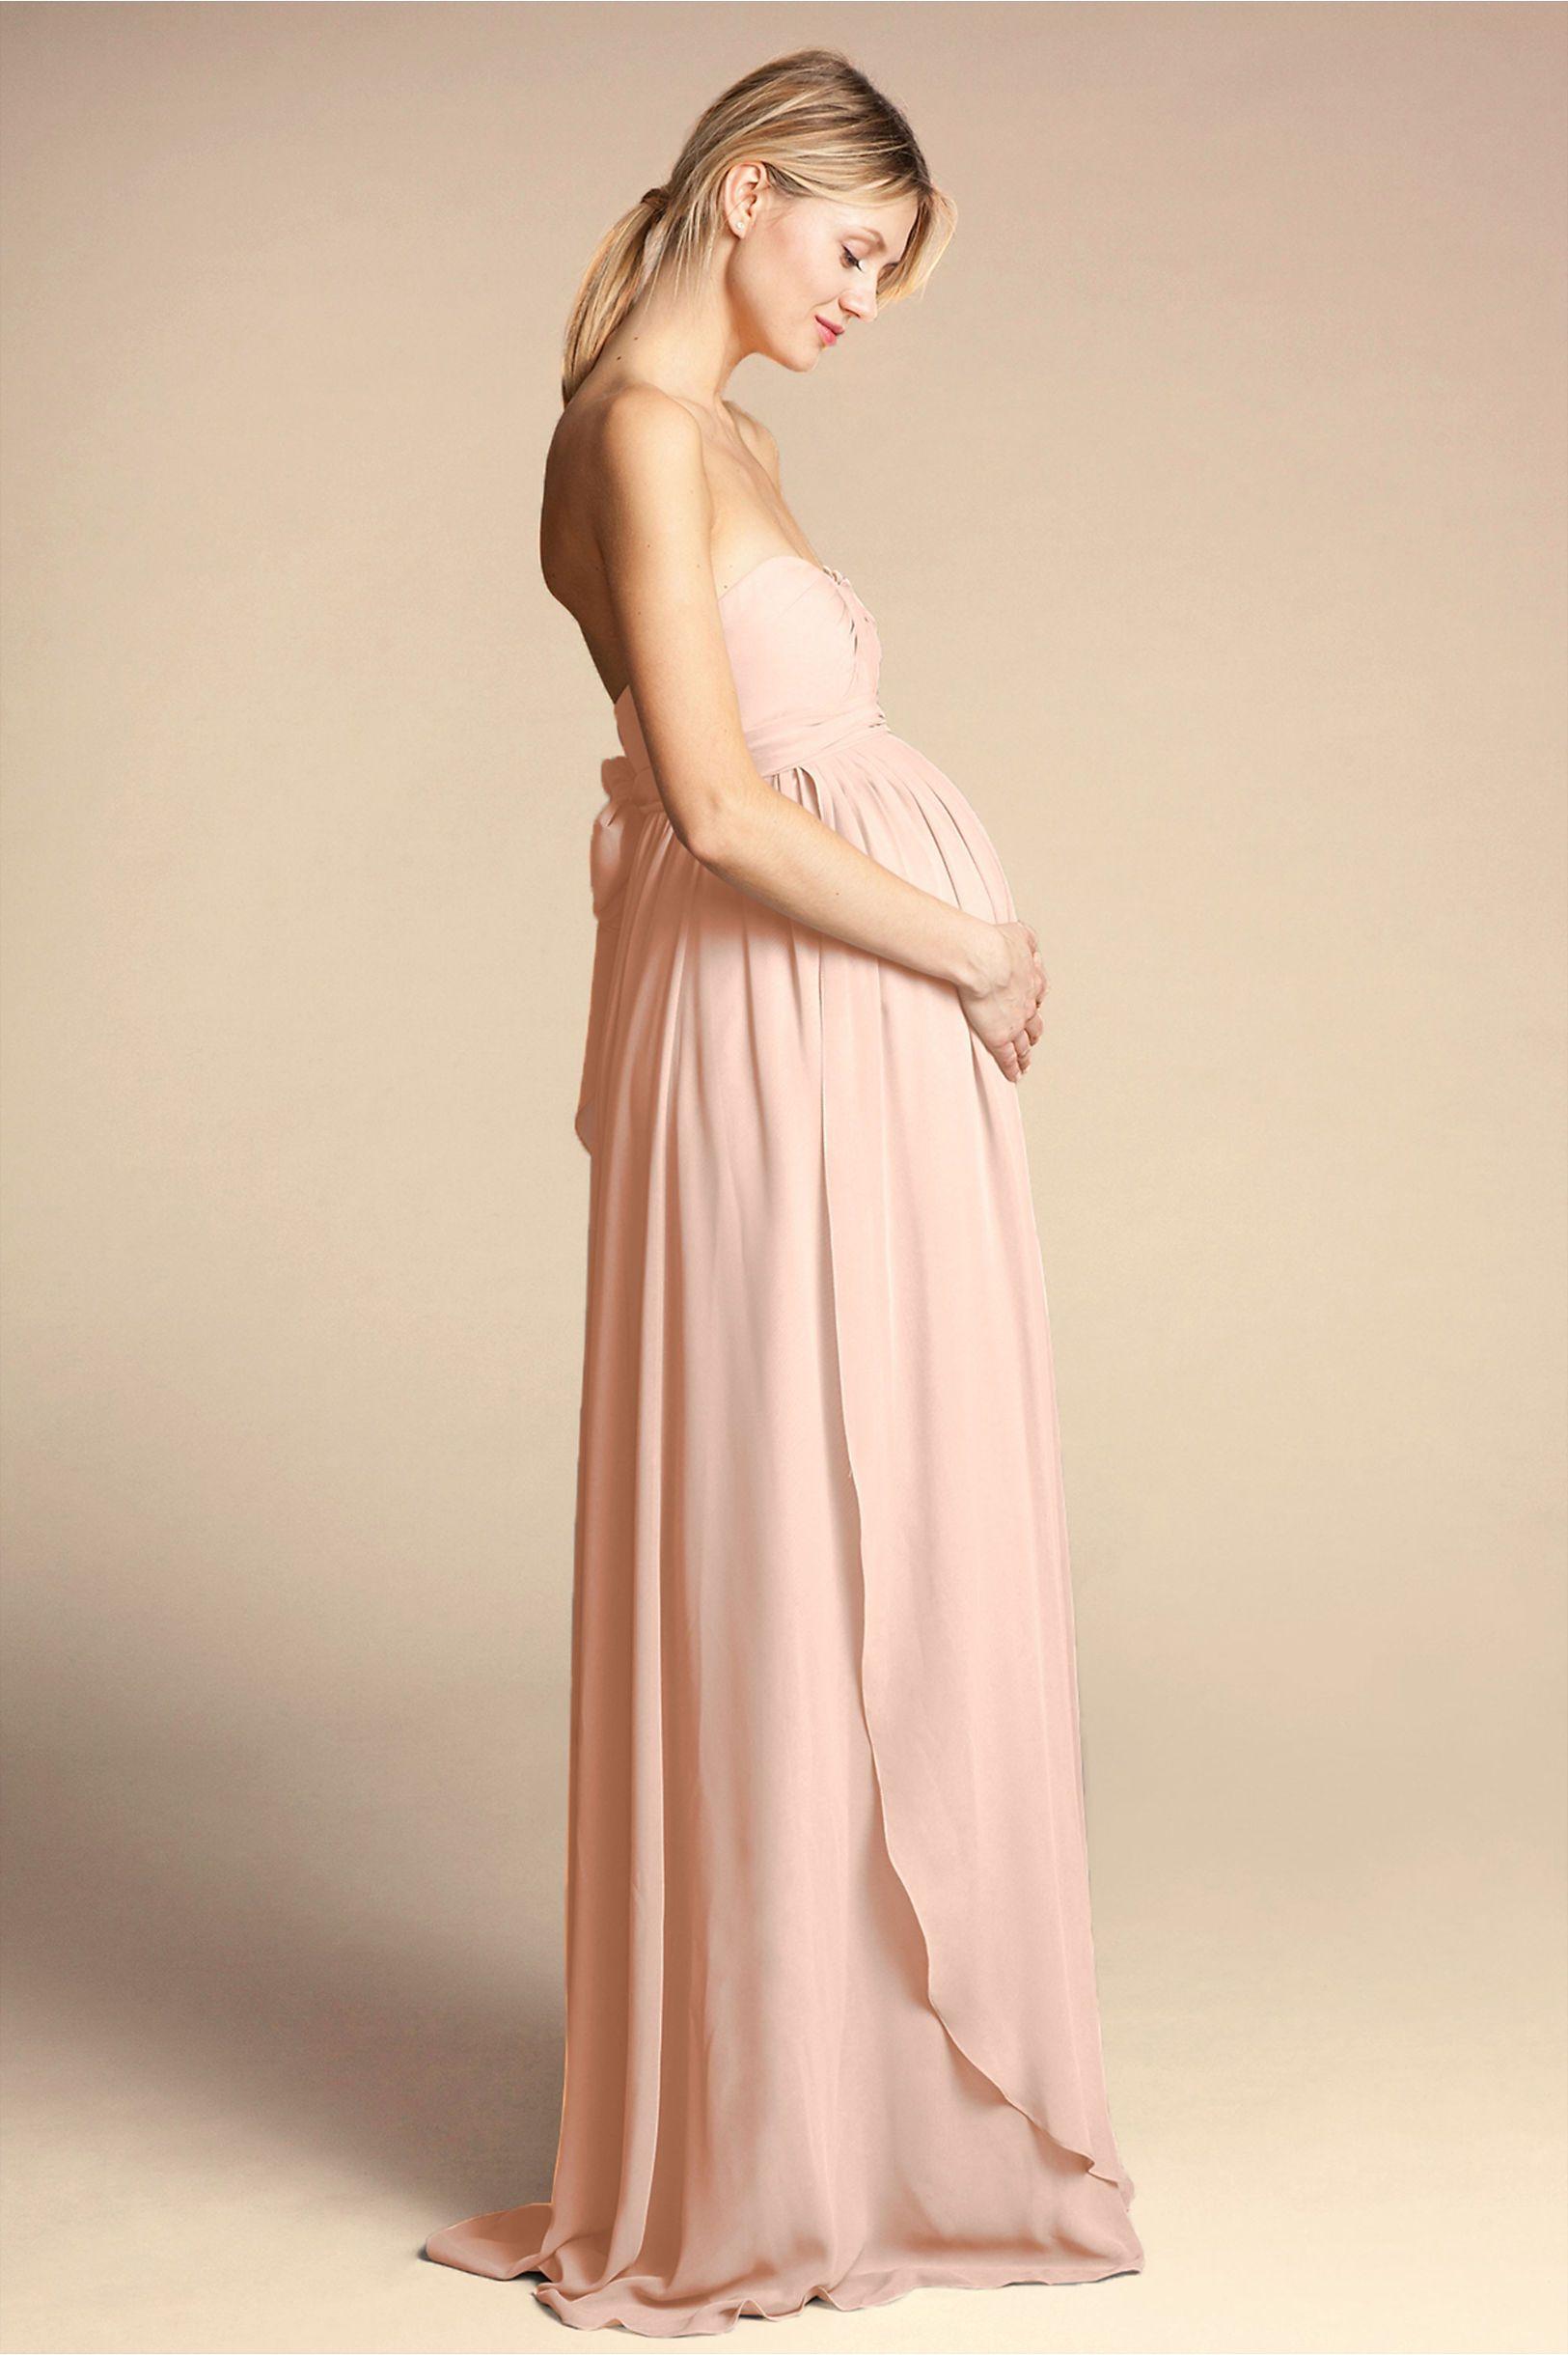 b13d0107f729a BHLDN's Jenny Yoo Cerise Maternity Dress in Blush | Products